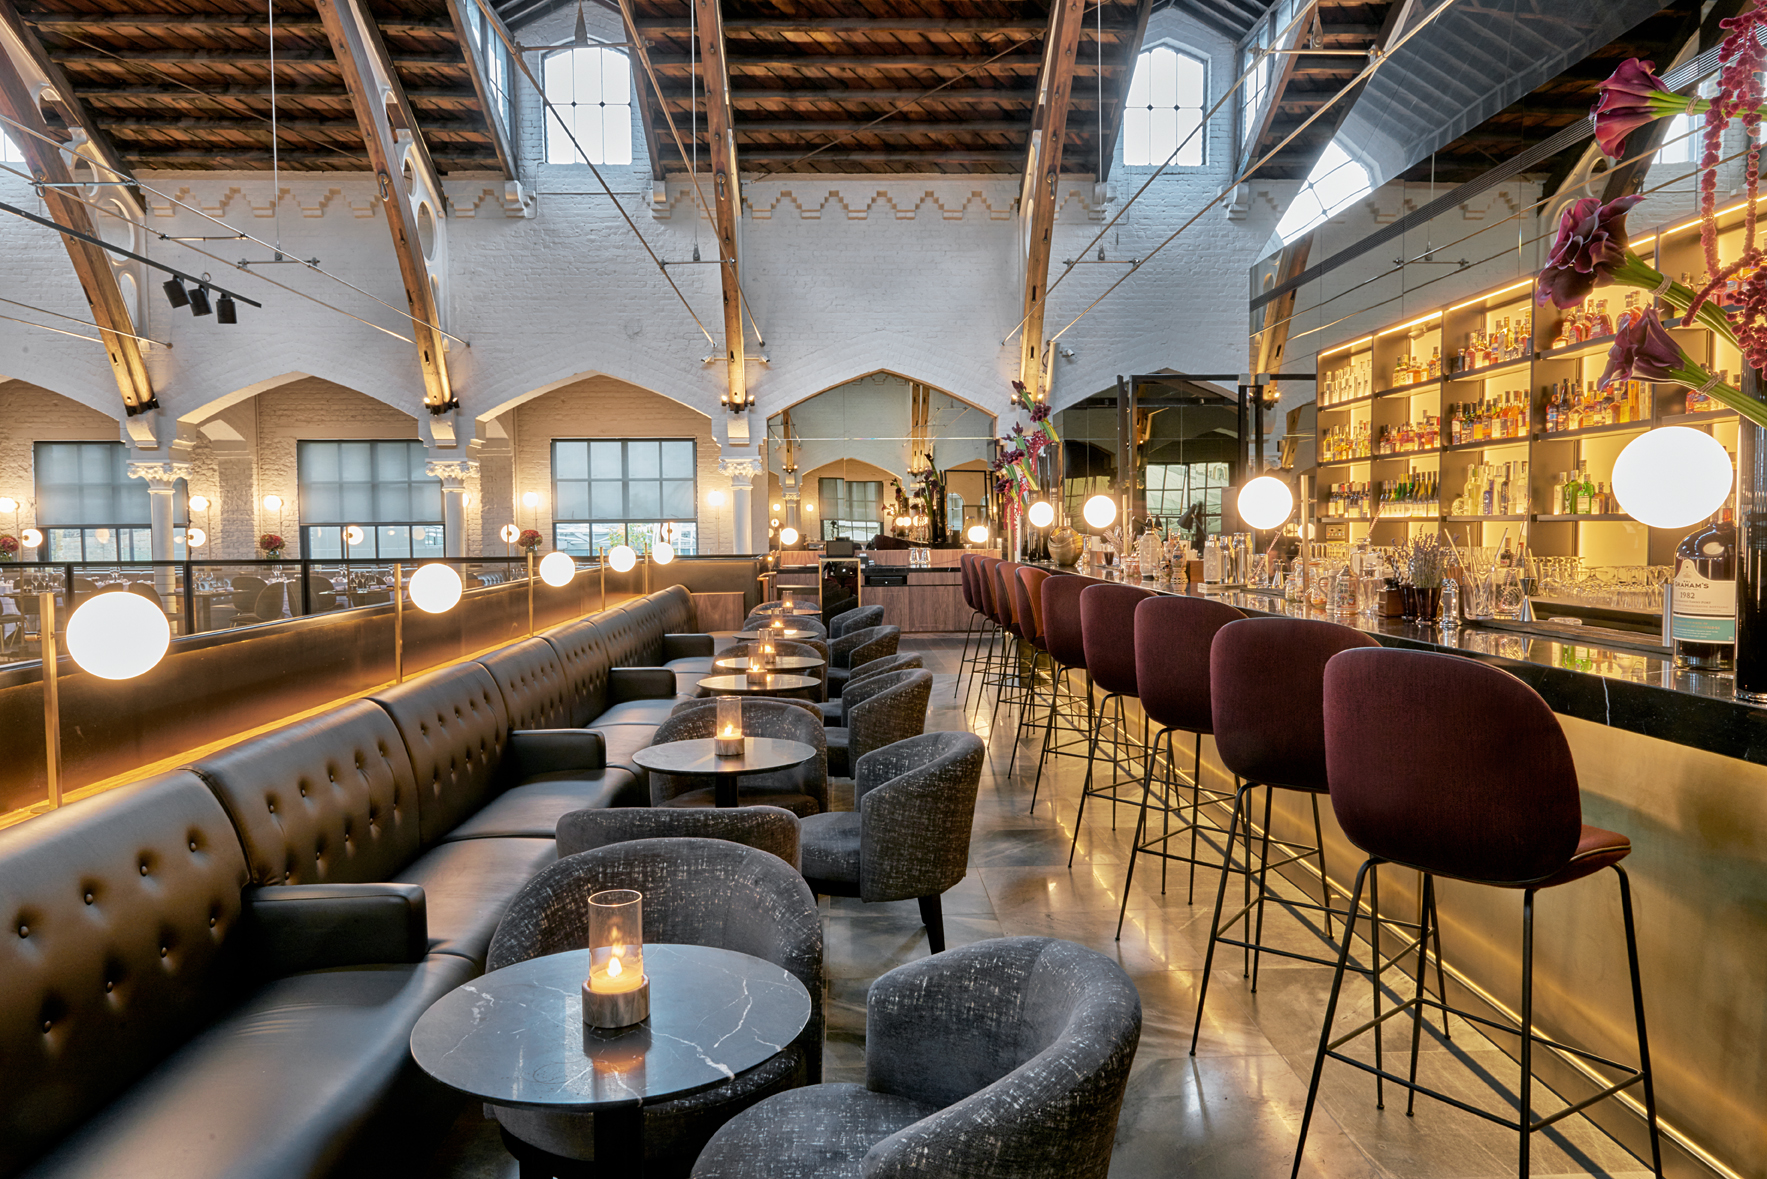 Londons German Gymnasium Wins Top Honors at Restaurant Design Awards